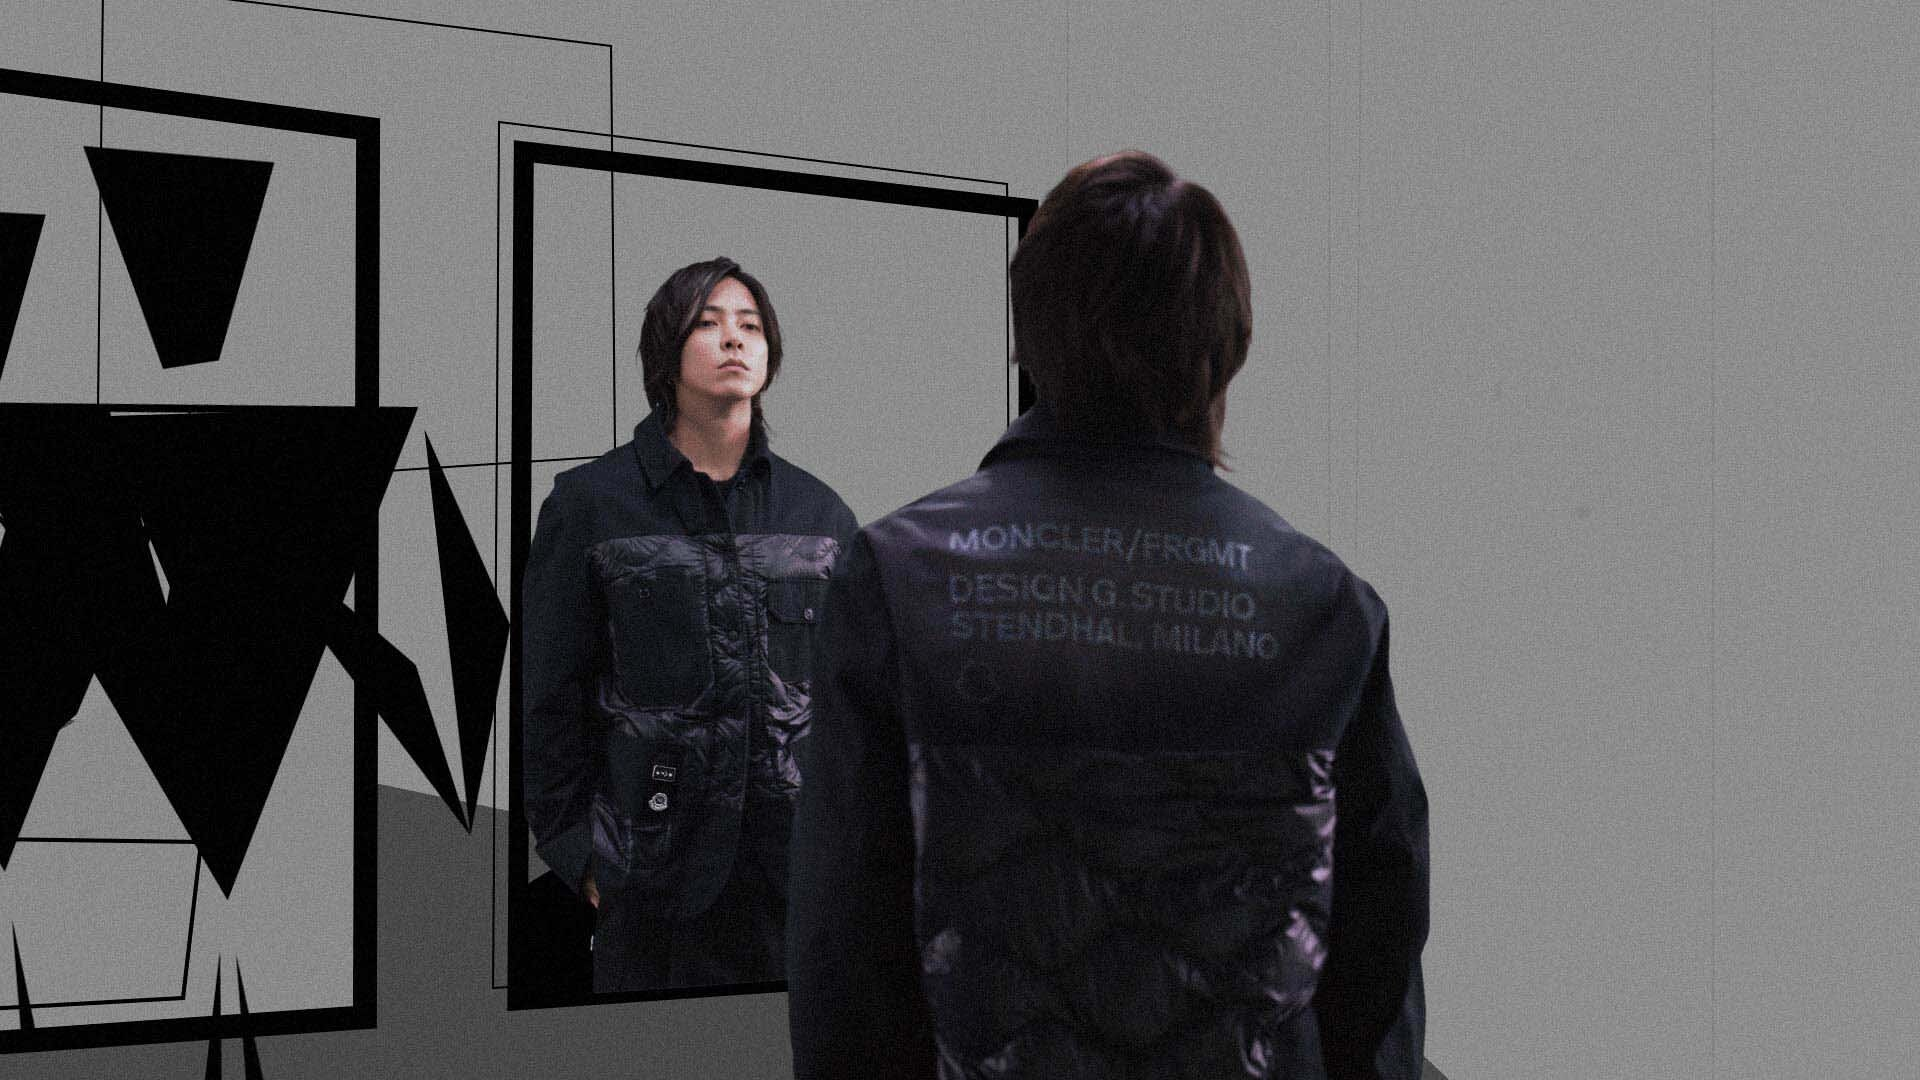 7 MONCLER FRGMT HIROSHI FUJIWARA